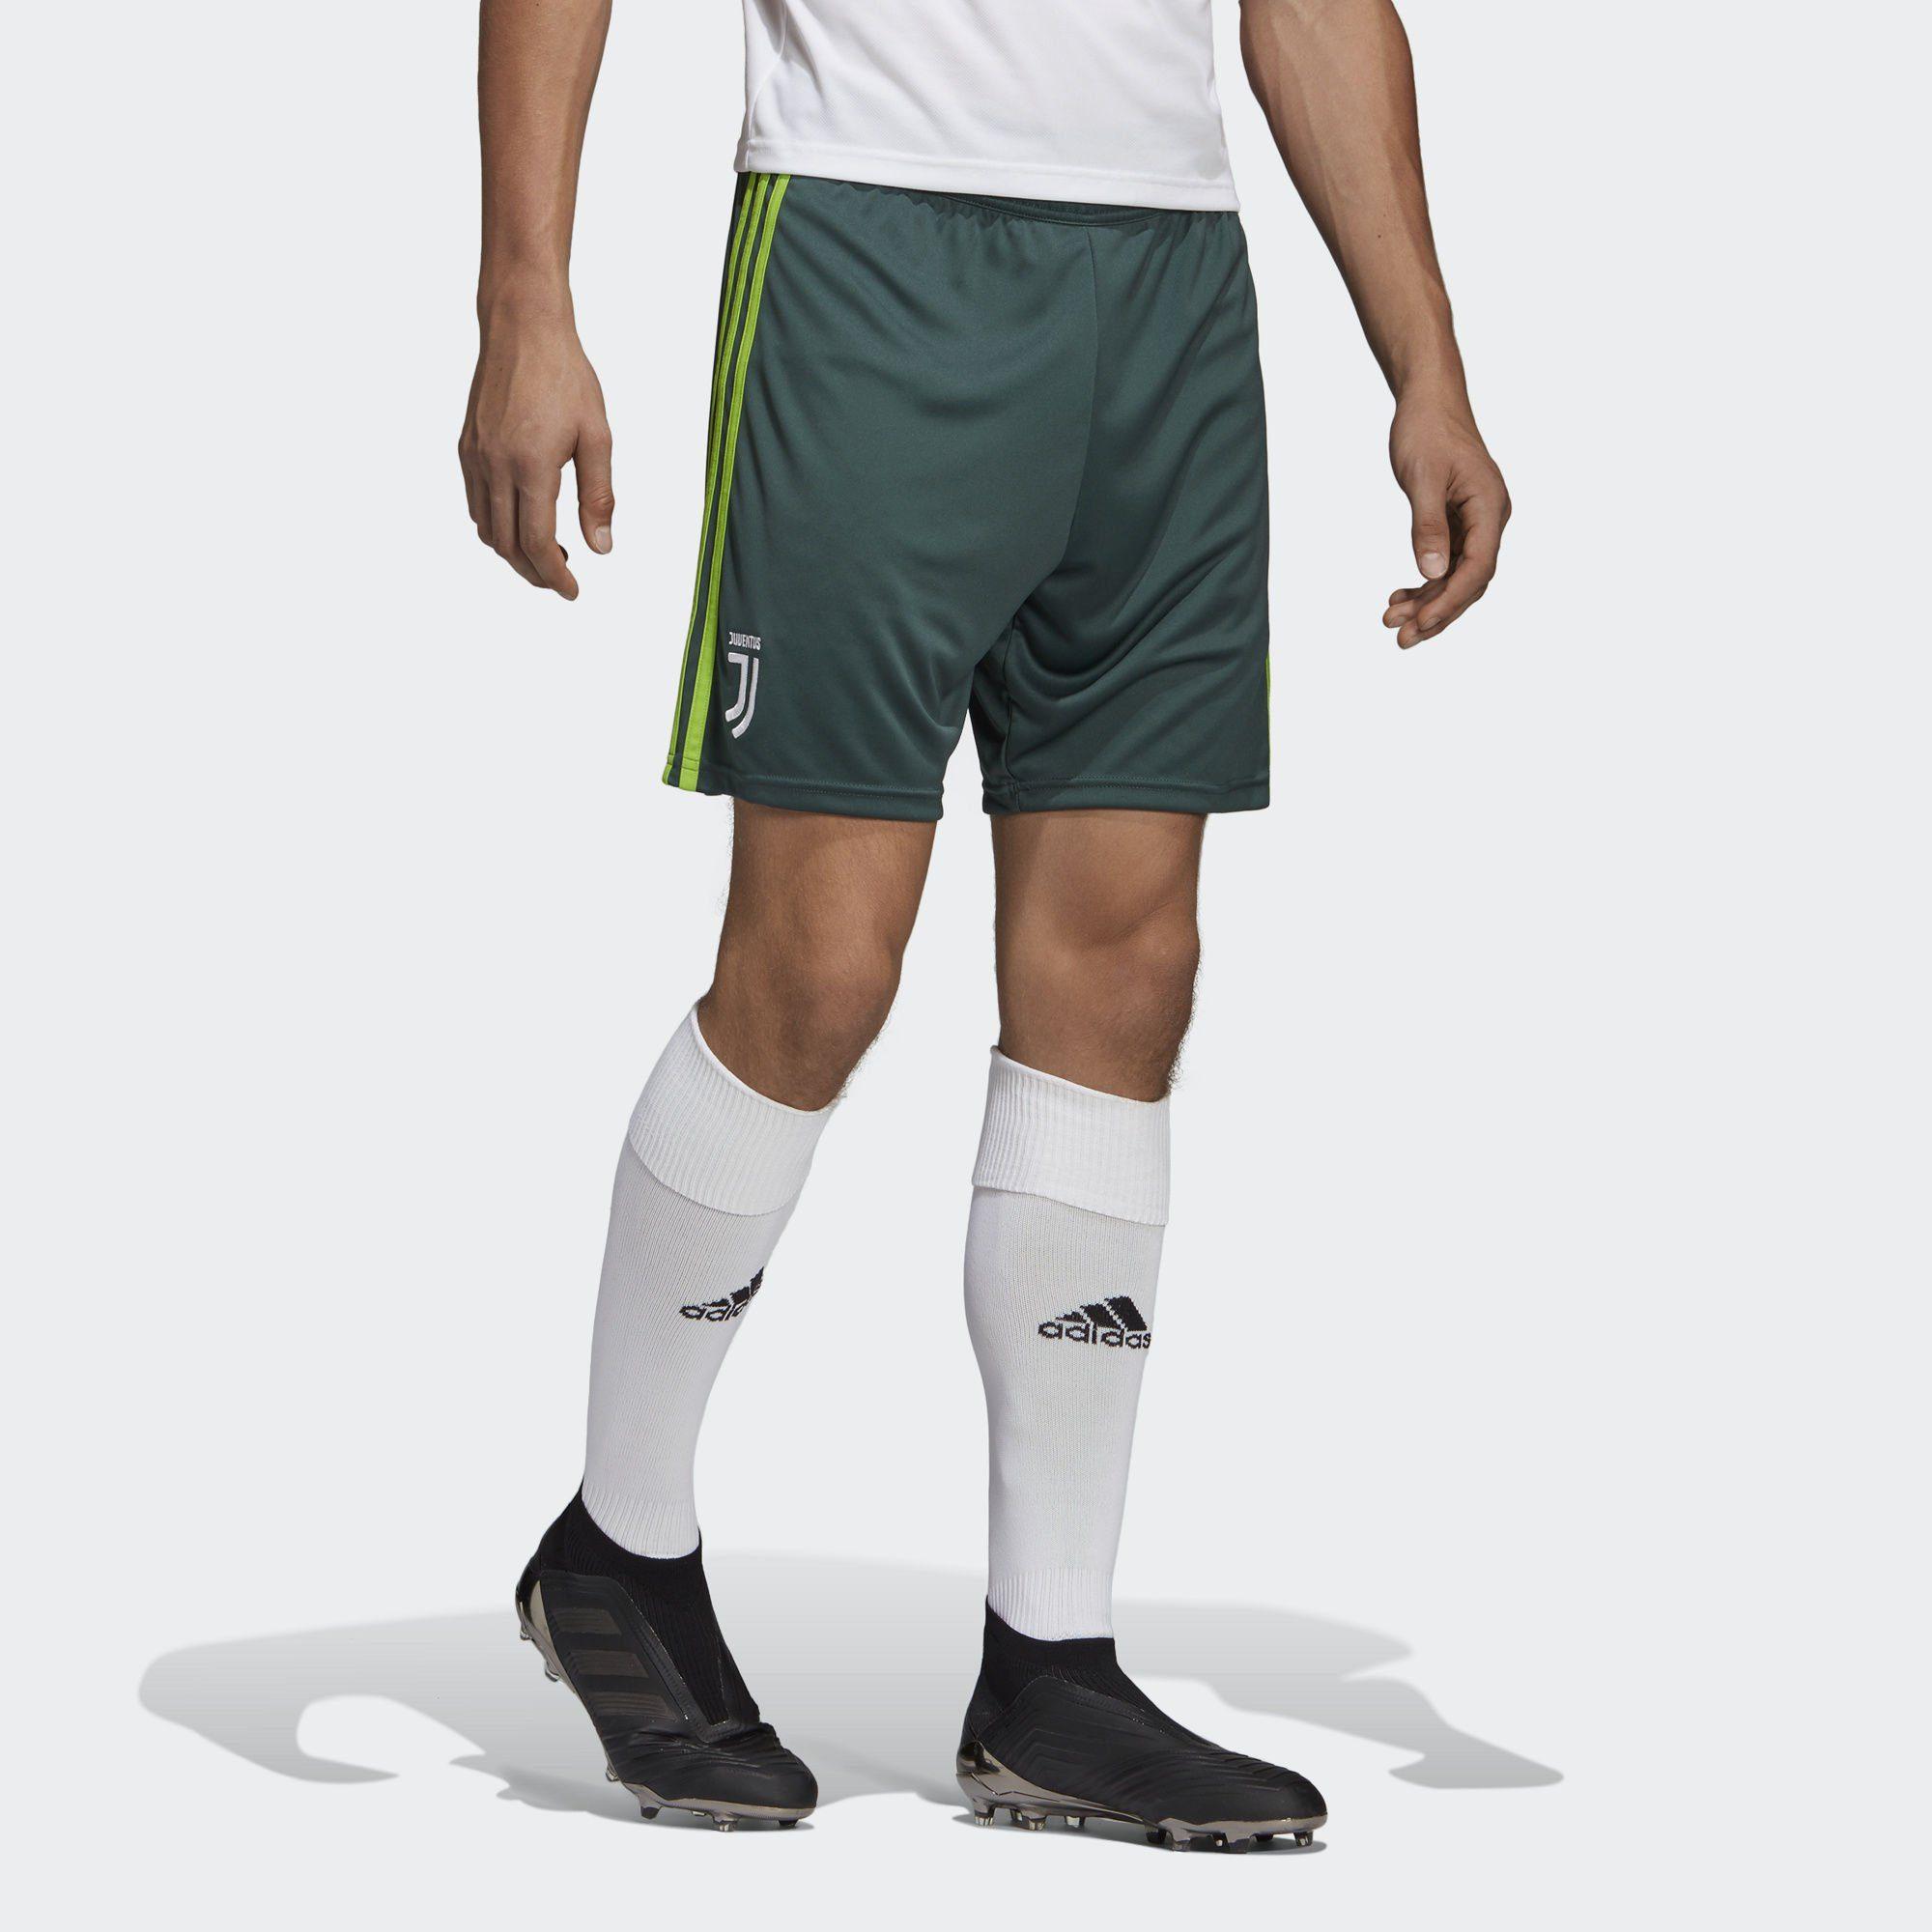 »juventus Performance Turin Shorts Kaufen Online Adidas Torwartshorts« Yb6gyf7